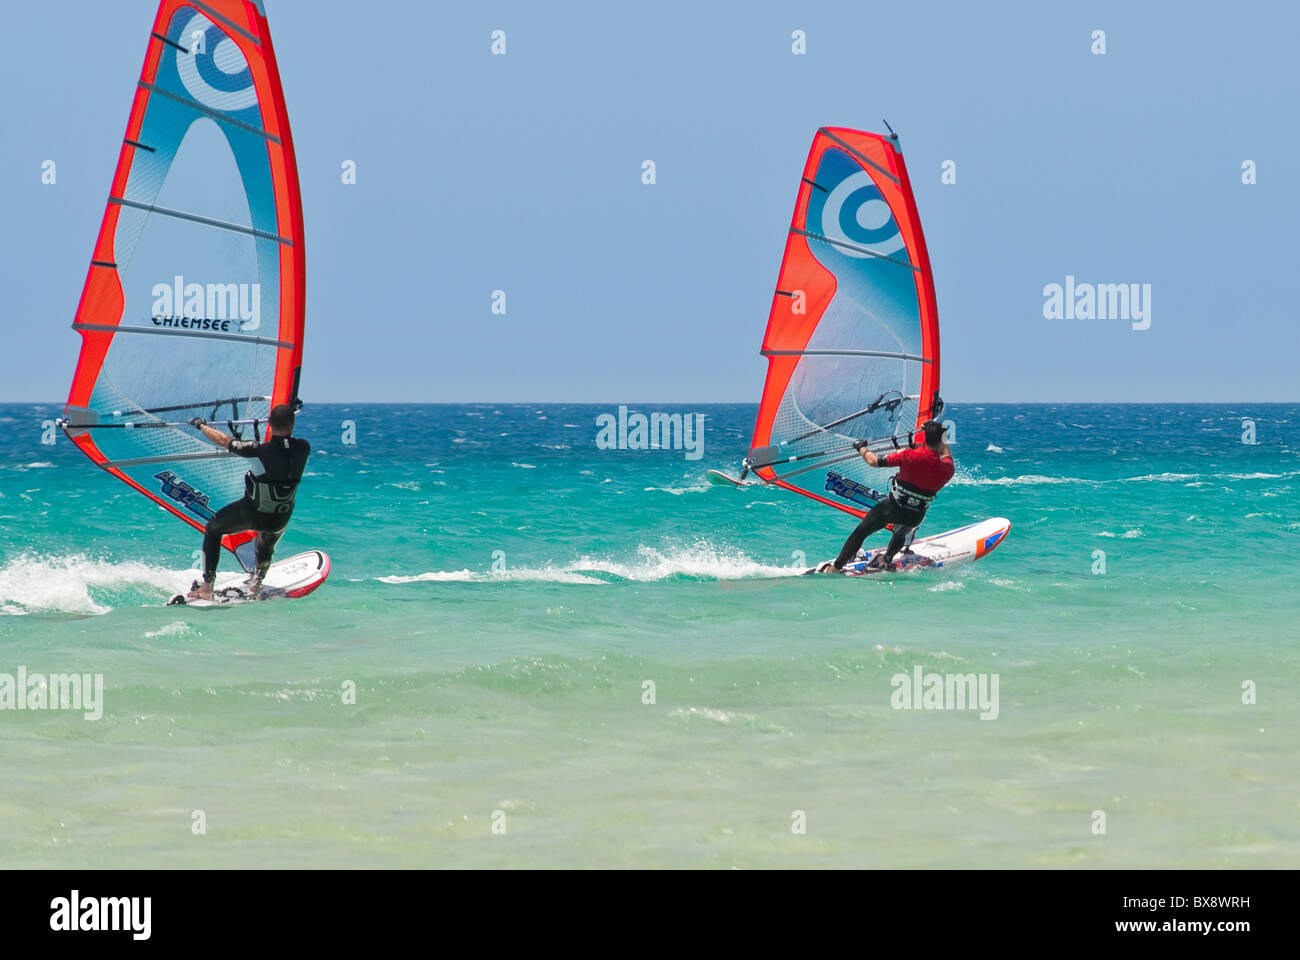 Windsurfen-Aktion auf Fuerteventura, Kanarische Inseln Stockbild